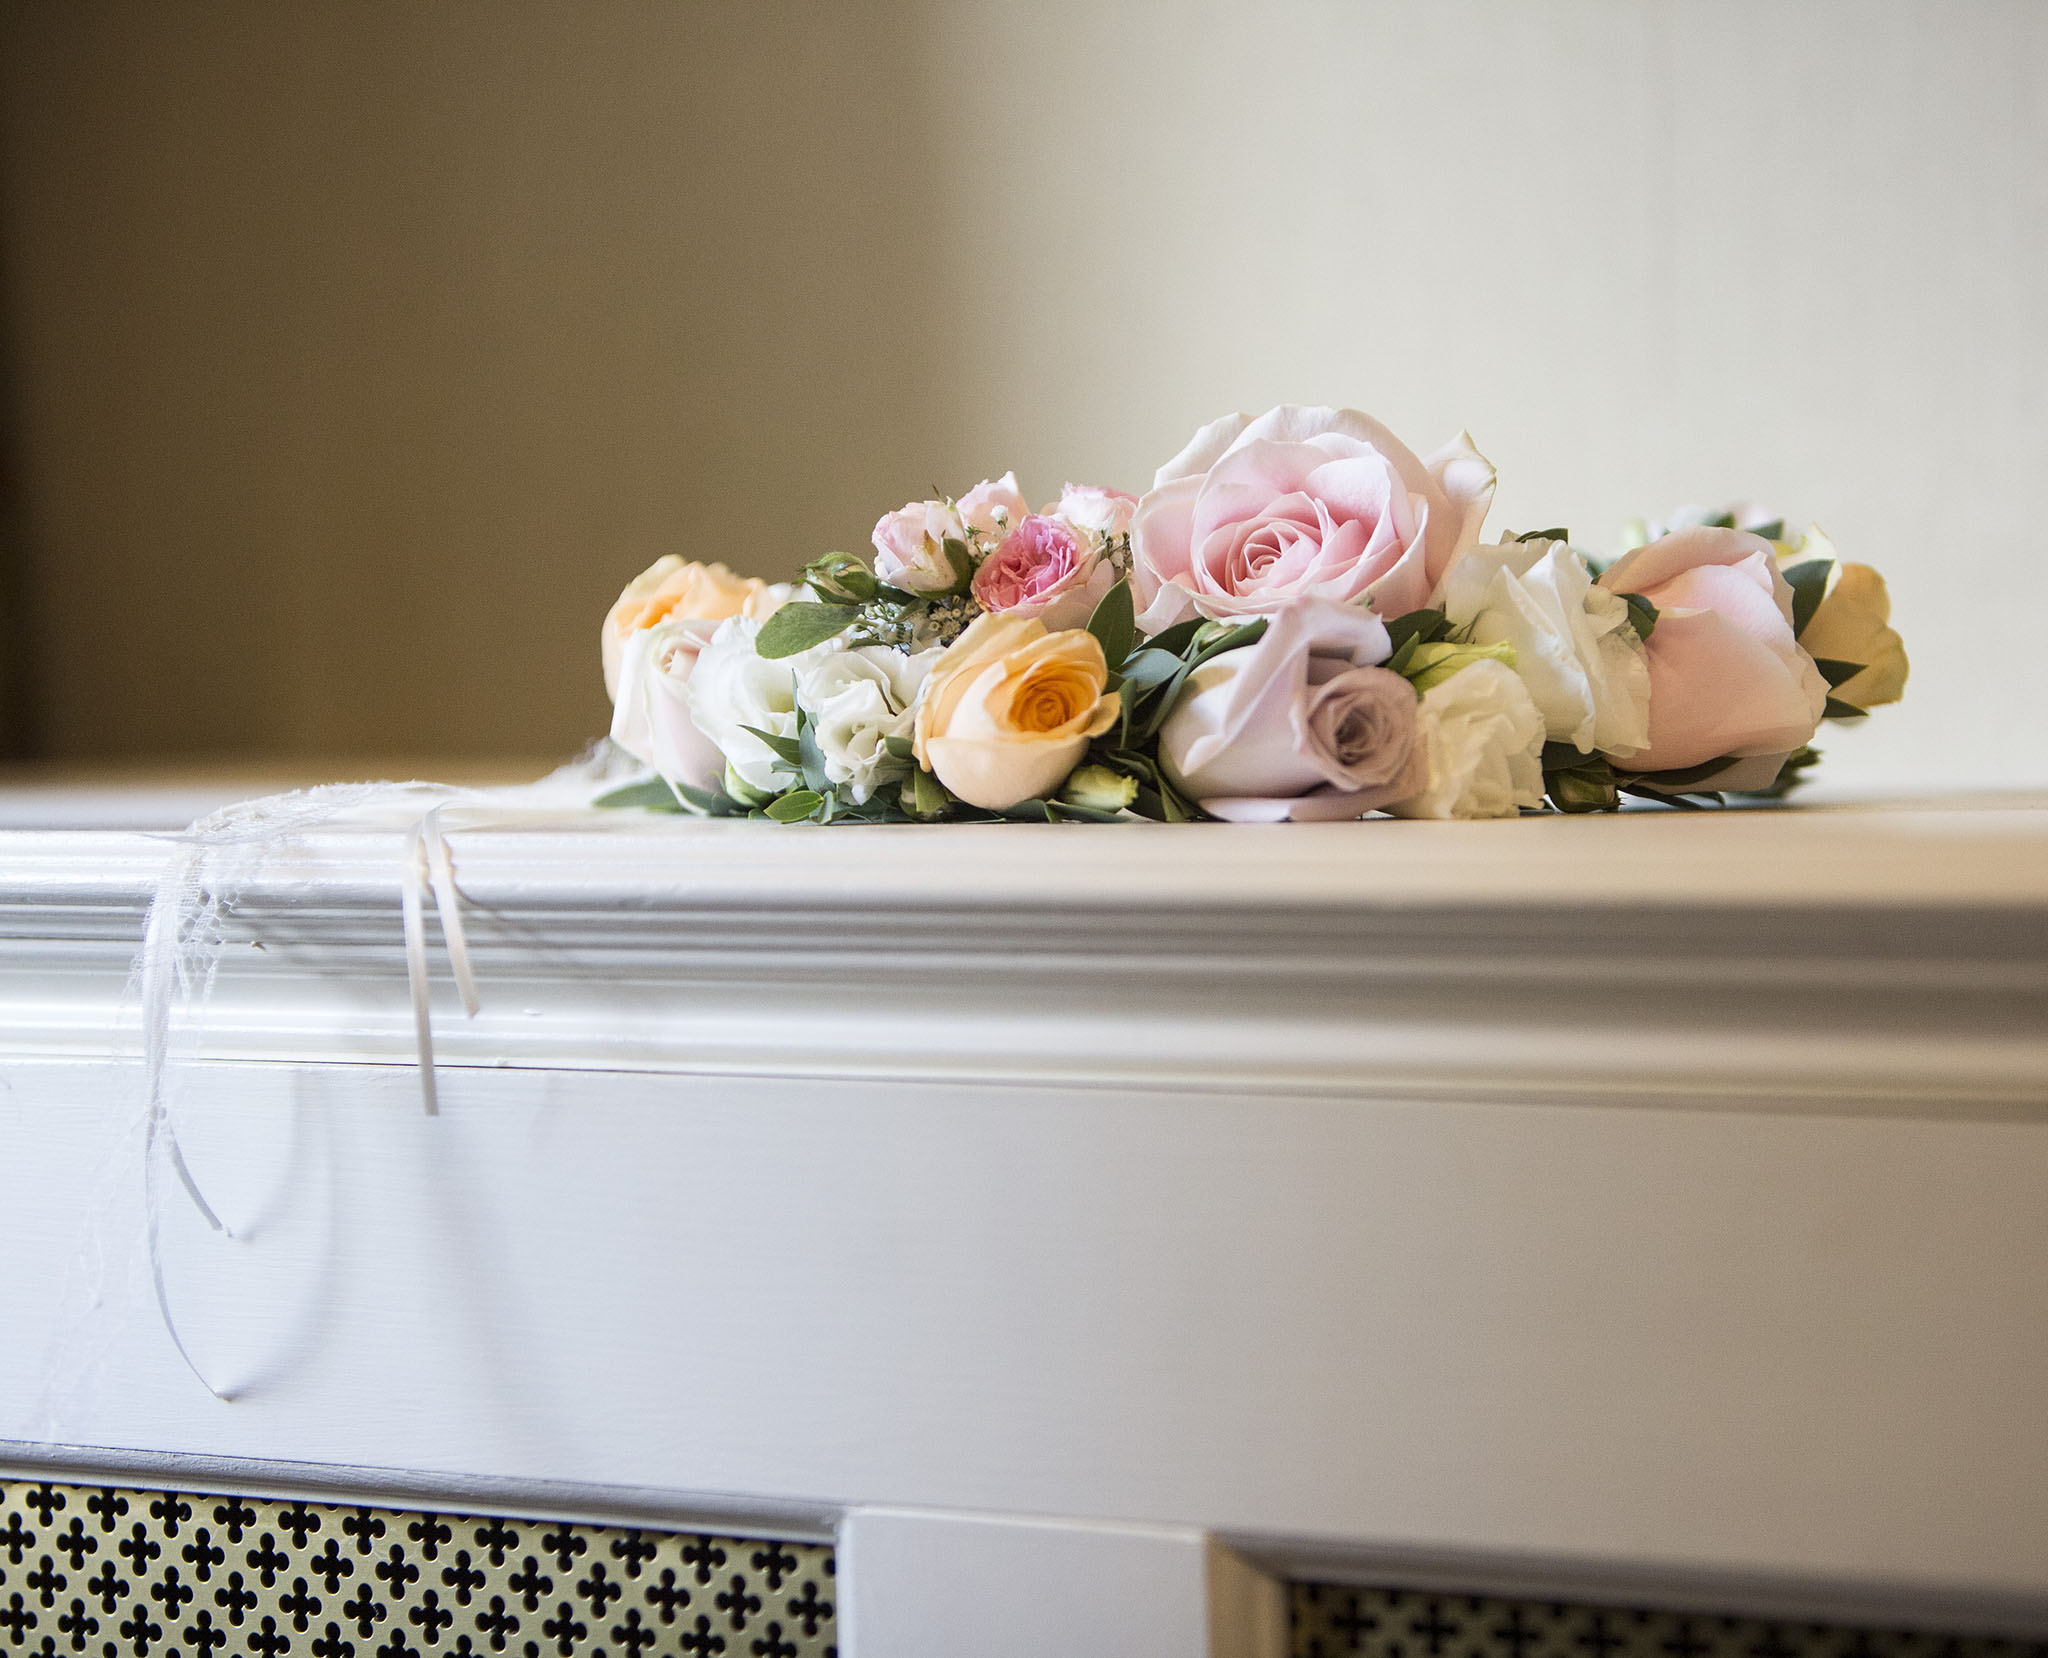 elizabethgphotography_kingslangley_hertfordshire_fineart_wedding_stmichaelsmanor_hotel_stalbans_luciejack_01.jpg